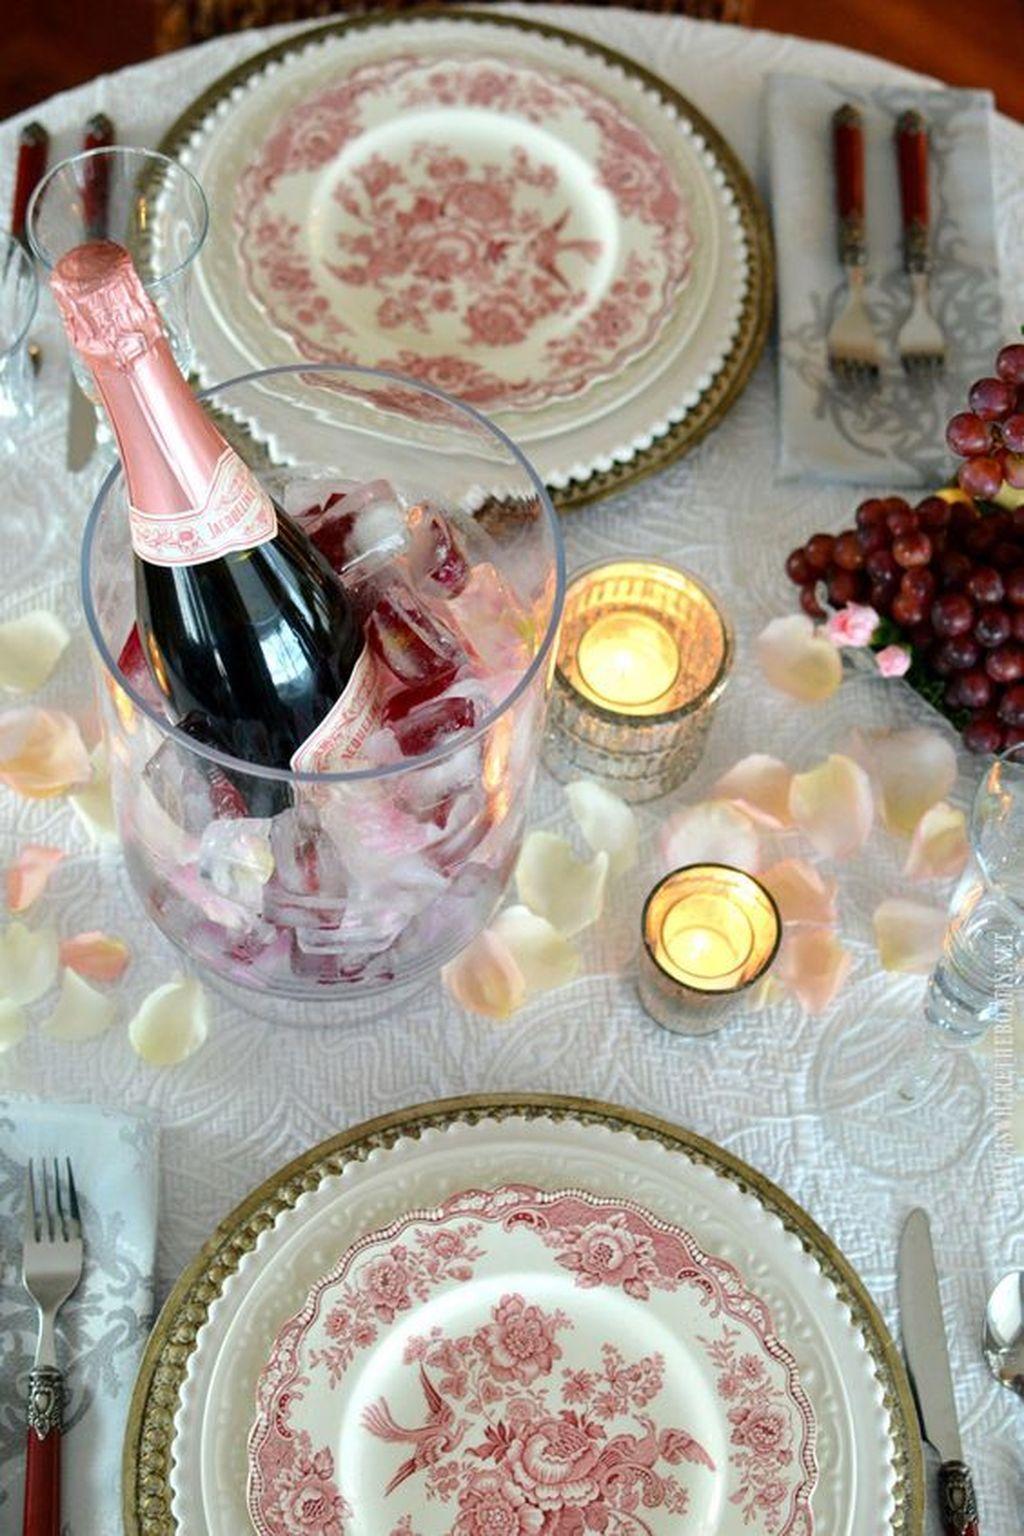 Inspiring Romantic Dining Table Decor Ideas 19